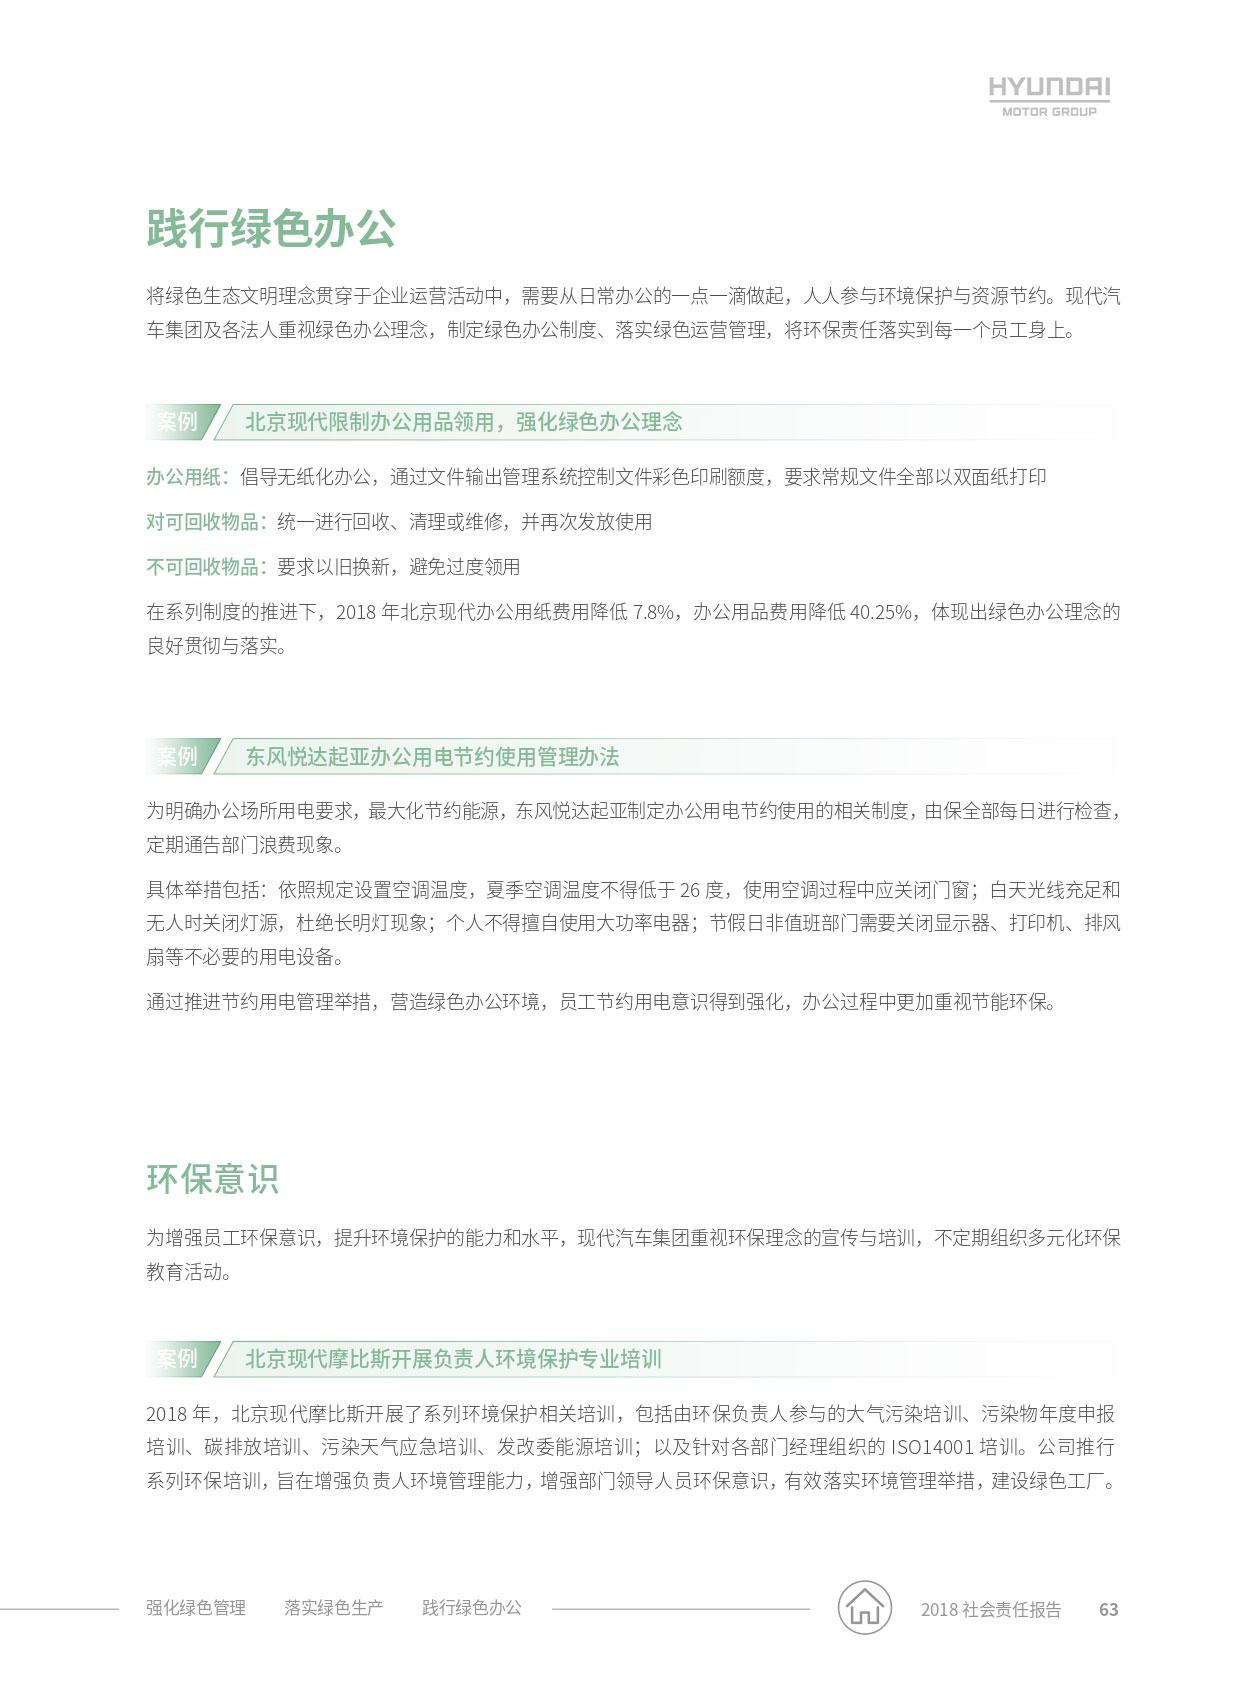 hyundai_china_csr_2018_page-0033_02